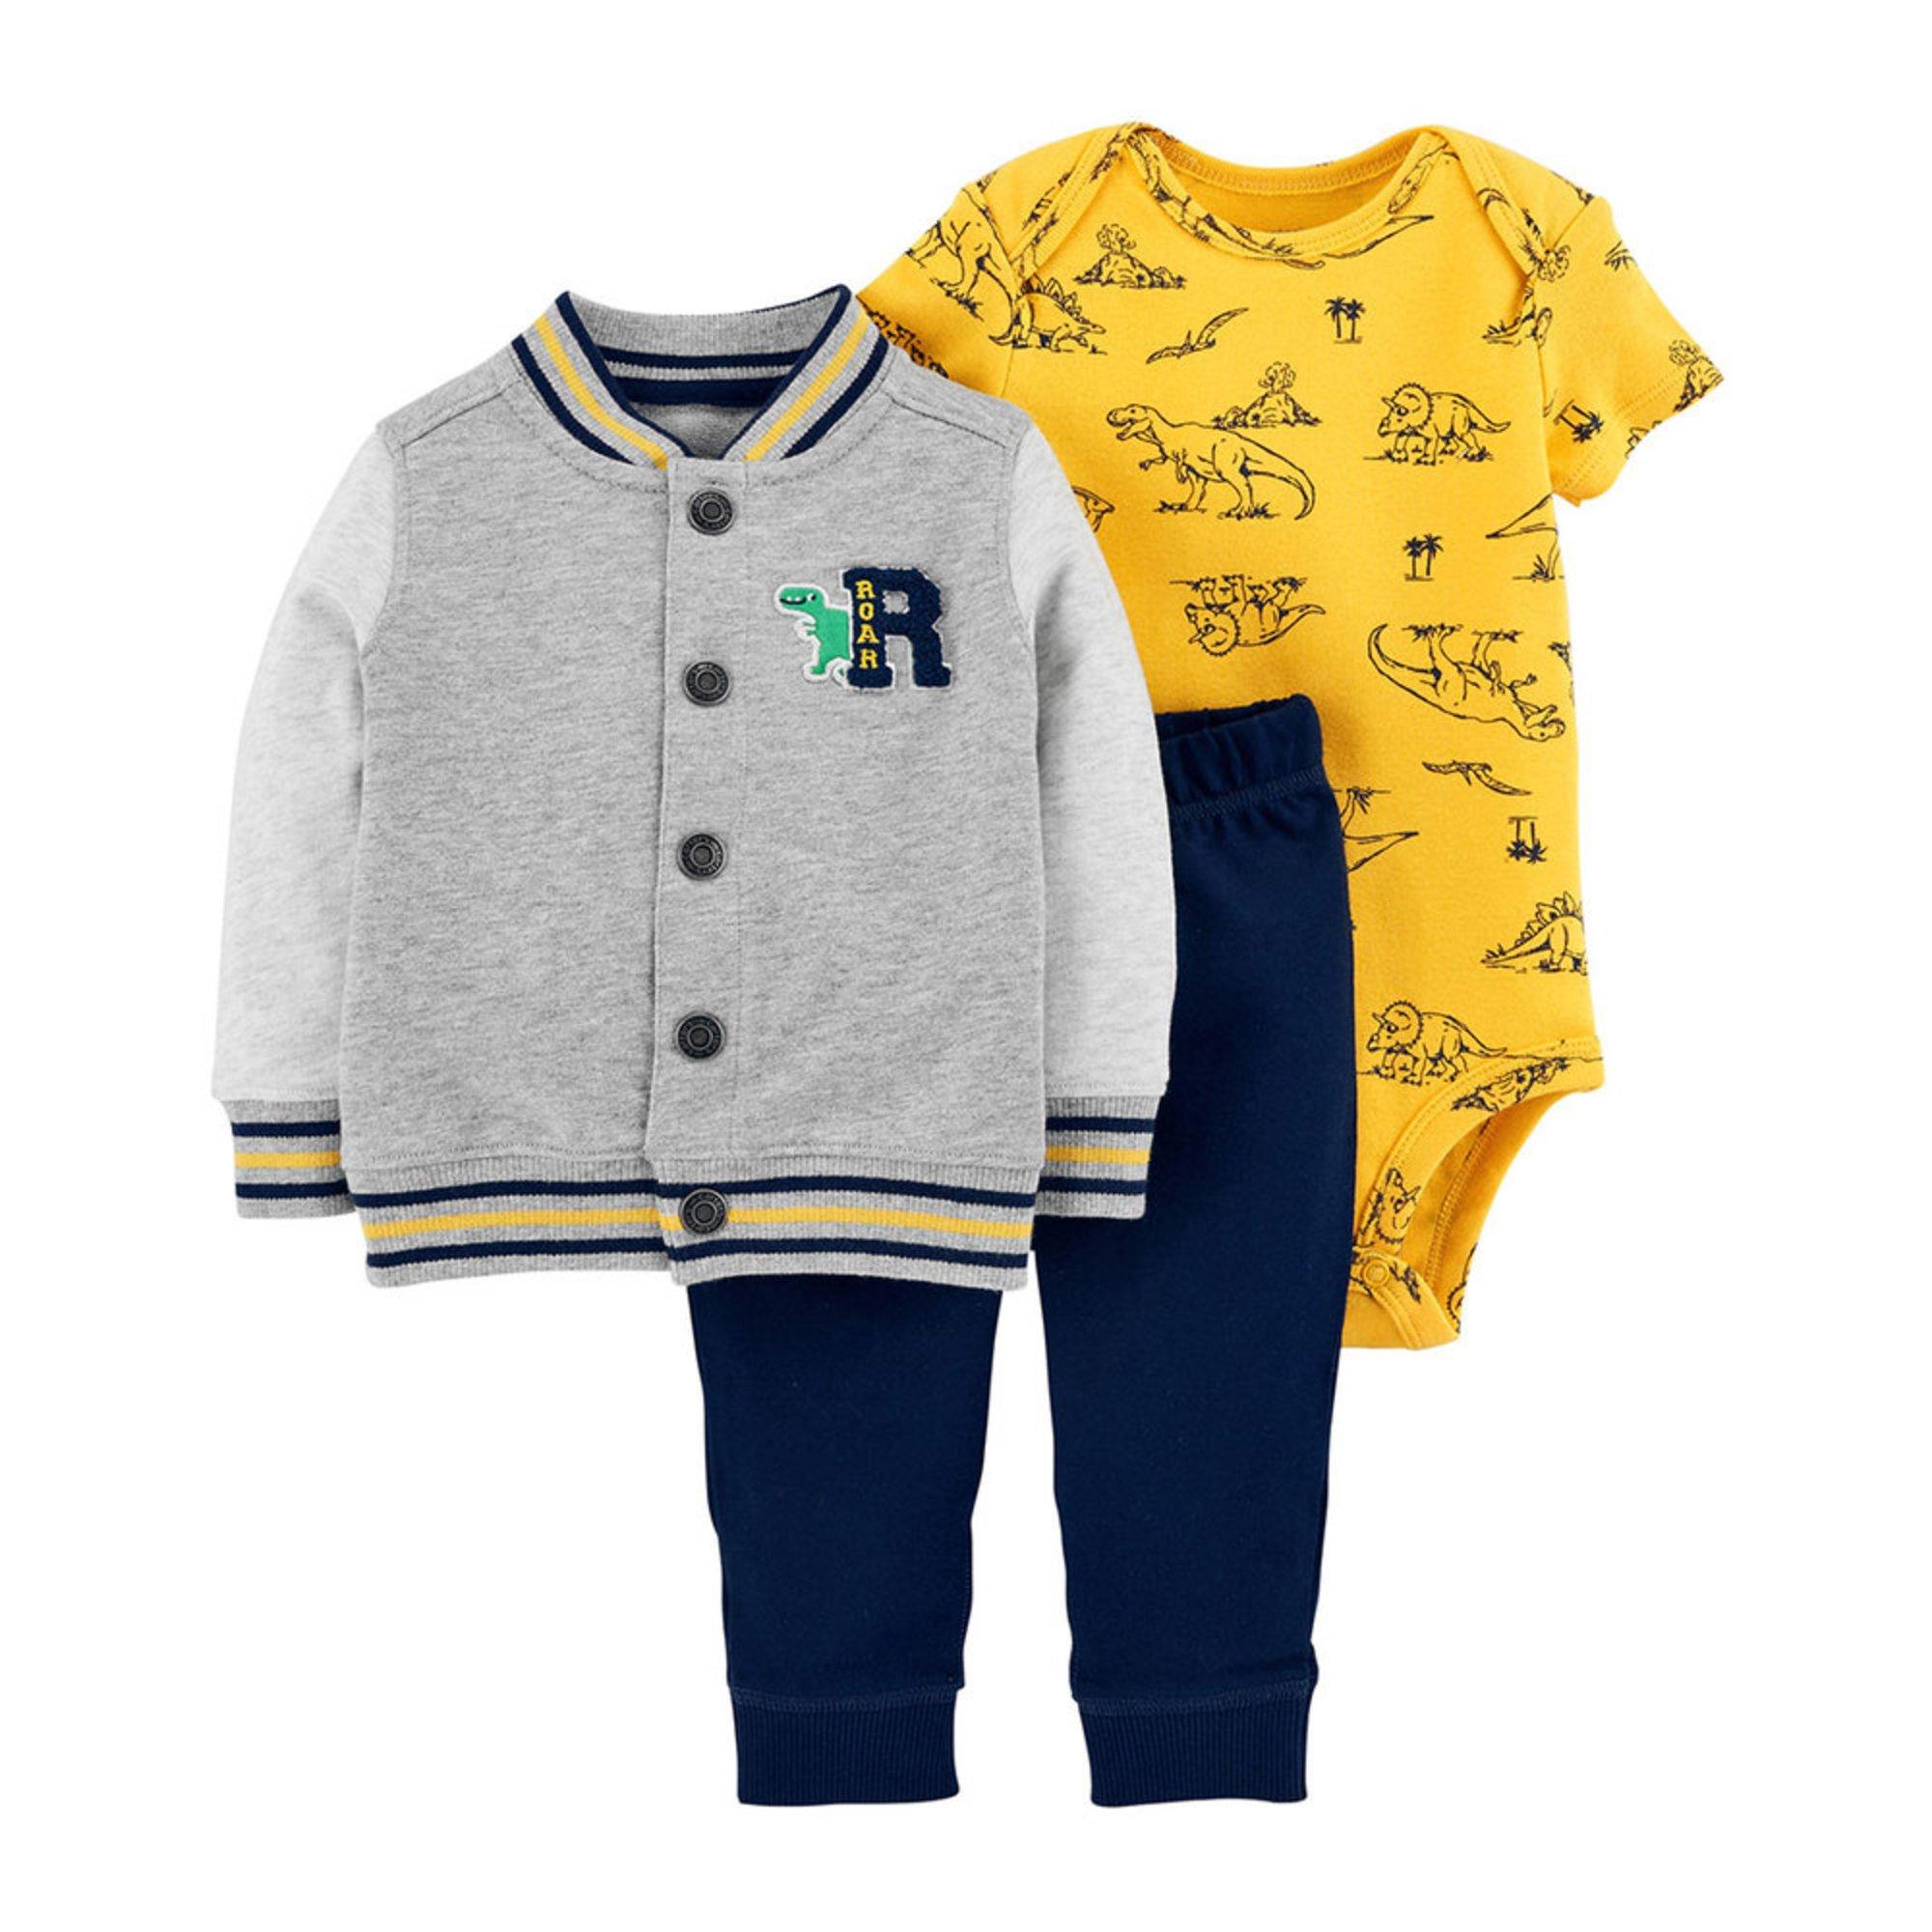 20cefc5530d9 Carter s Baby Boys  3-piece Cardigan Set